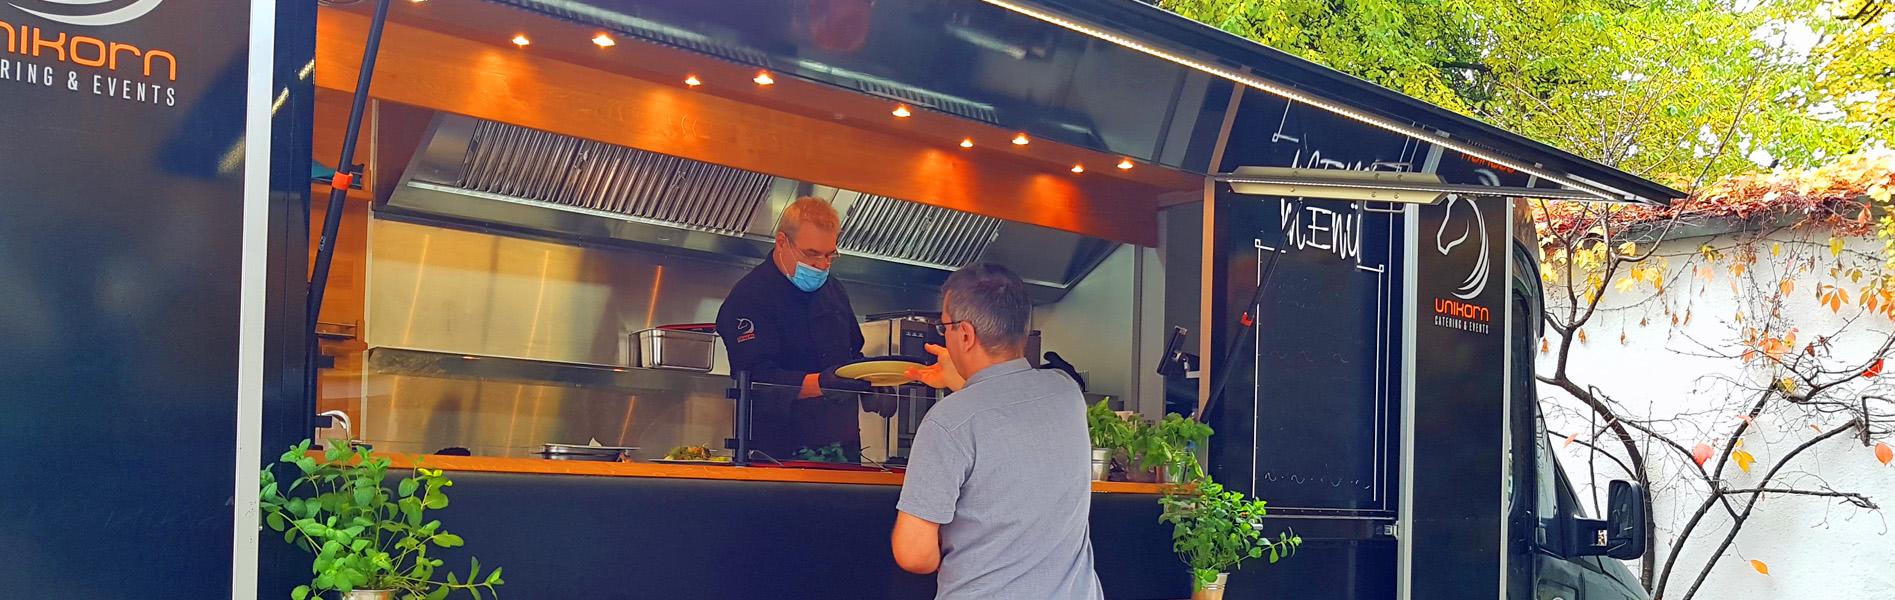 Gast am UNIKORN Foodtruck - Foodtruck Catering München